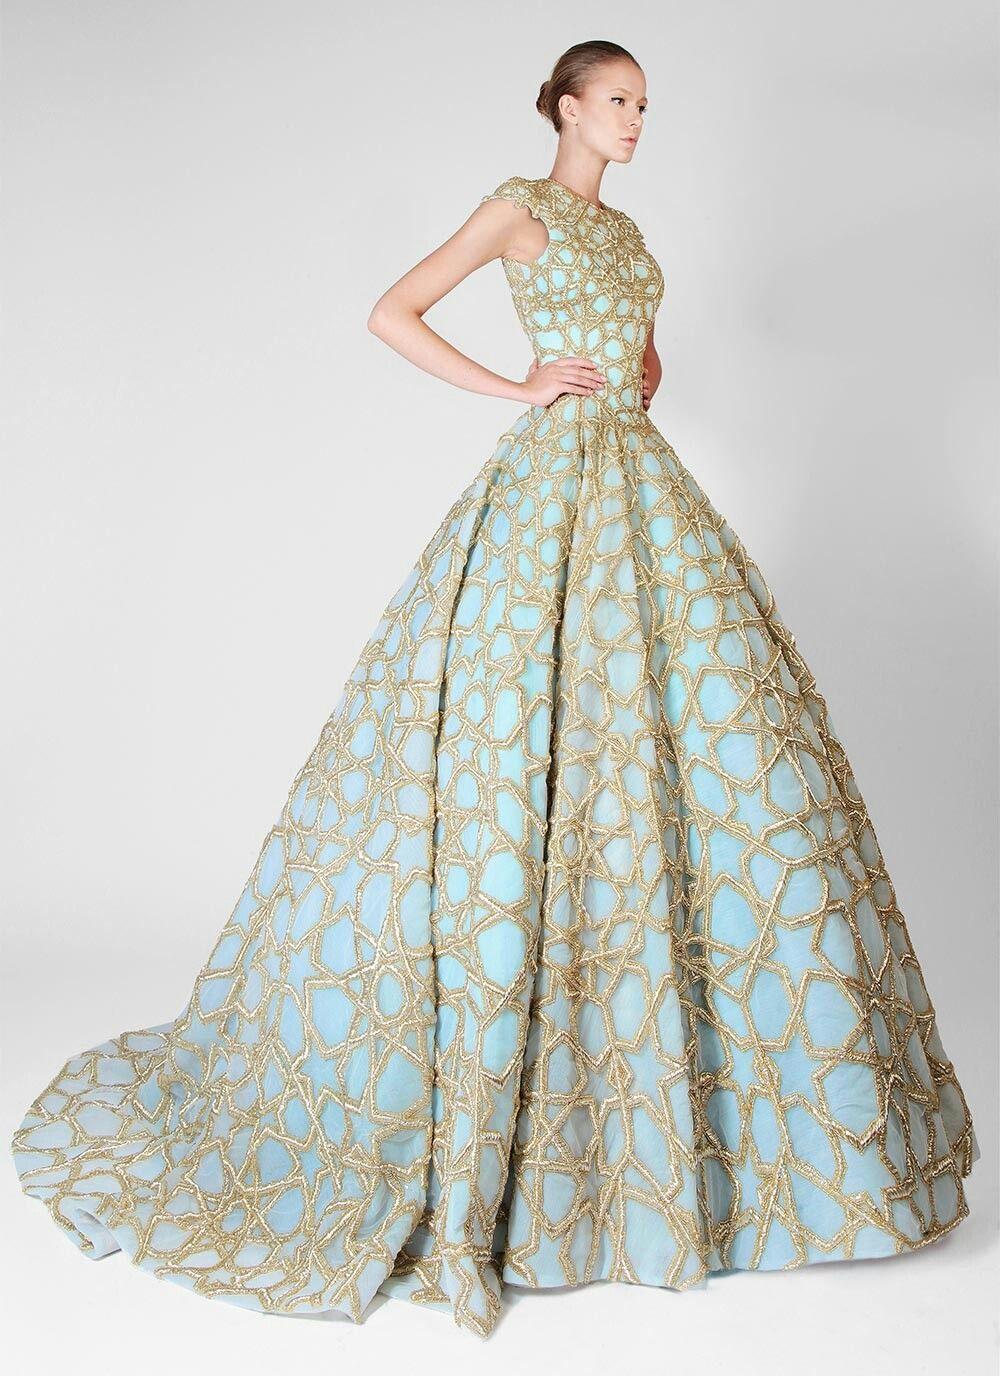 37ad2b6111 Where To Buy Unusual Wedding Dresses - Gomes Weine AG